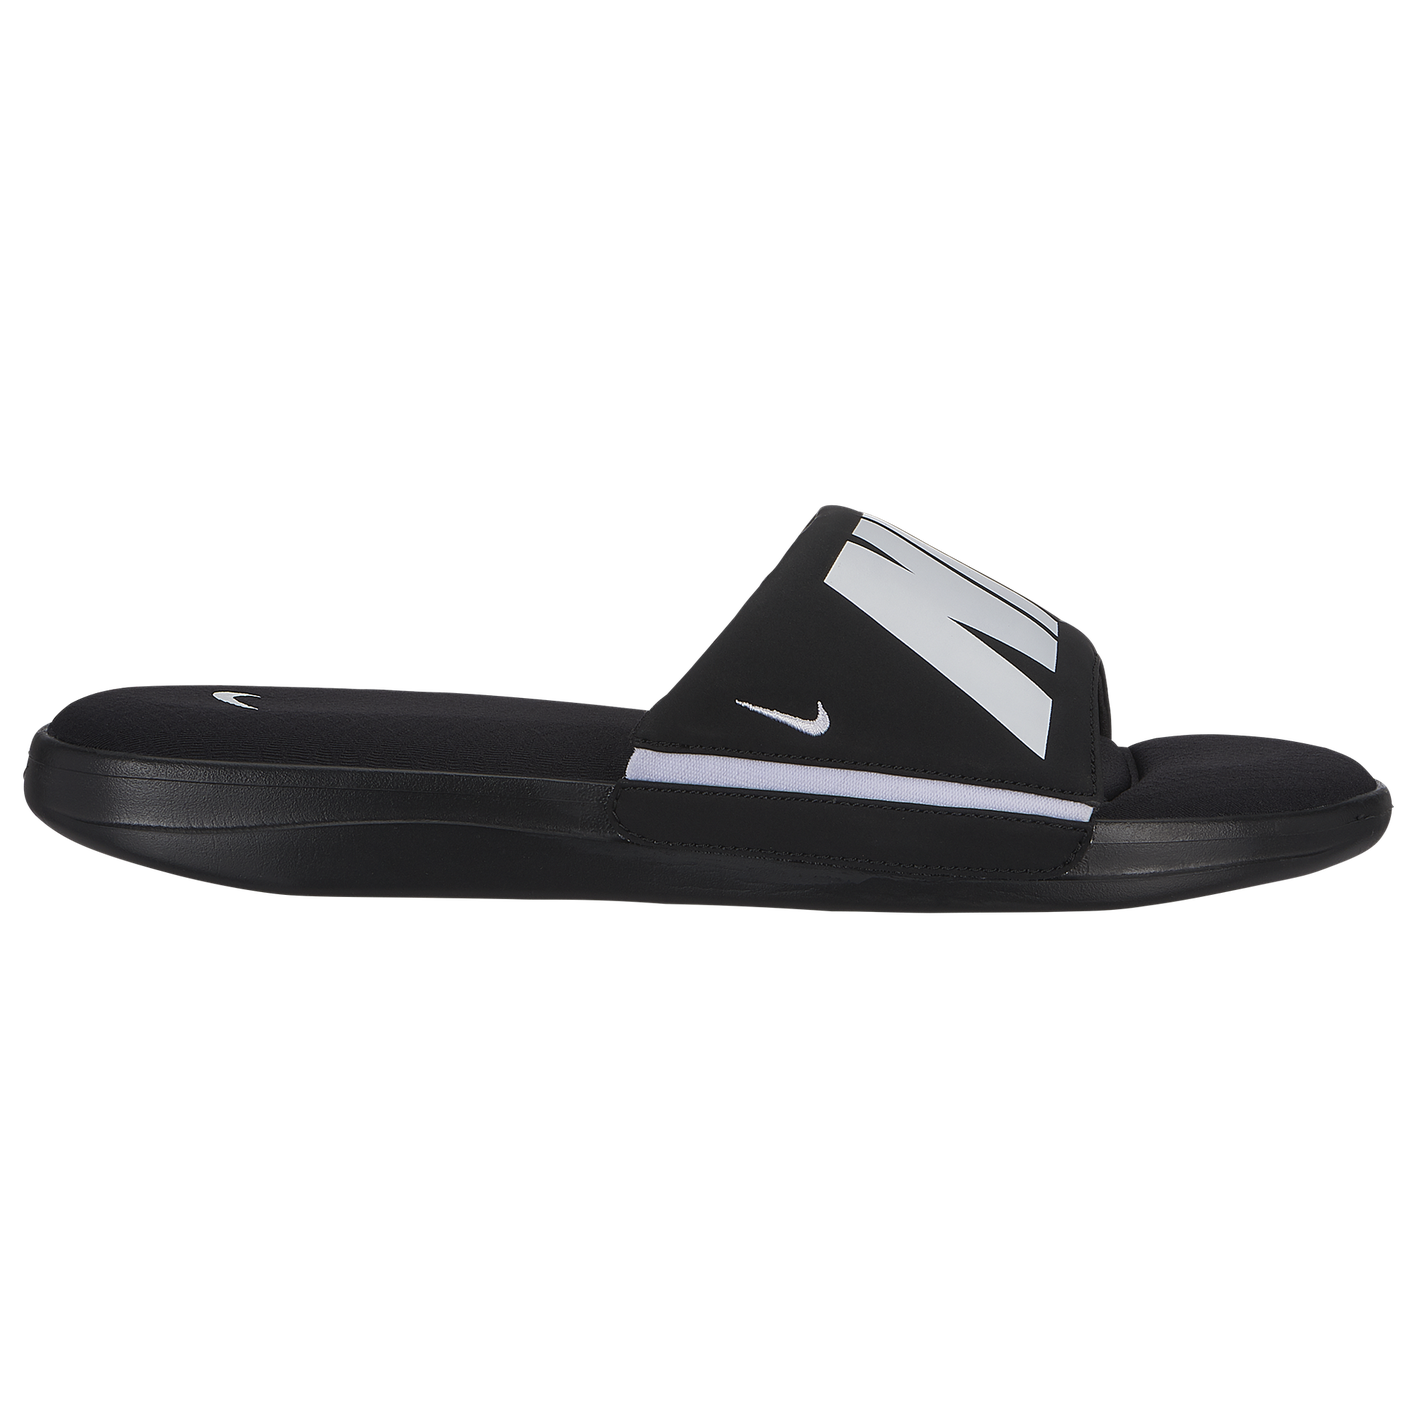 3ac450a3cd55 Nike Ultra Comfort 3 Slide - Men s - Casual - Shoes - Black White Black